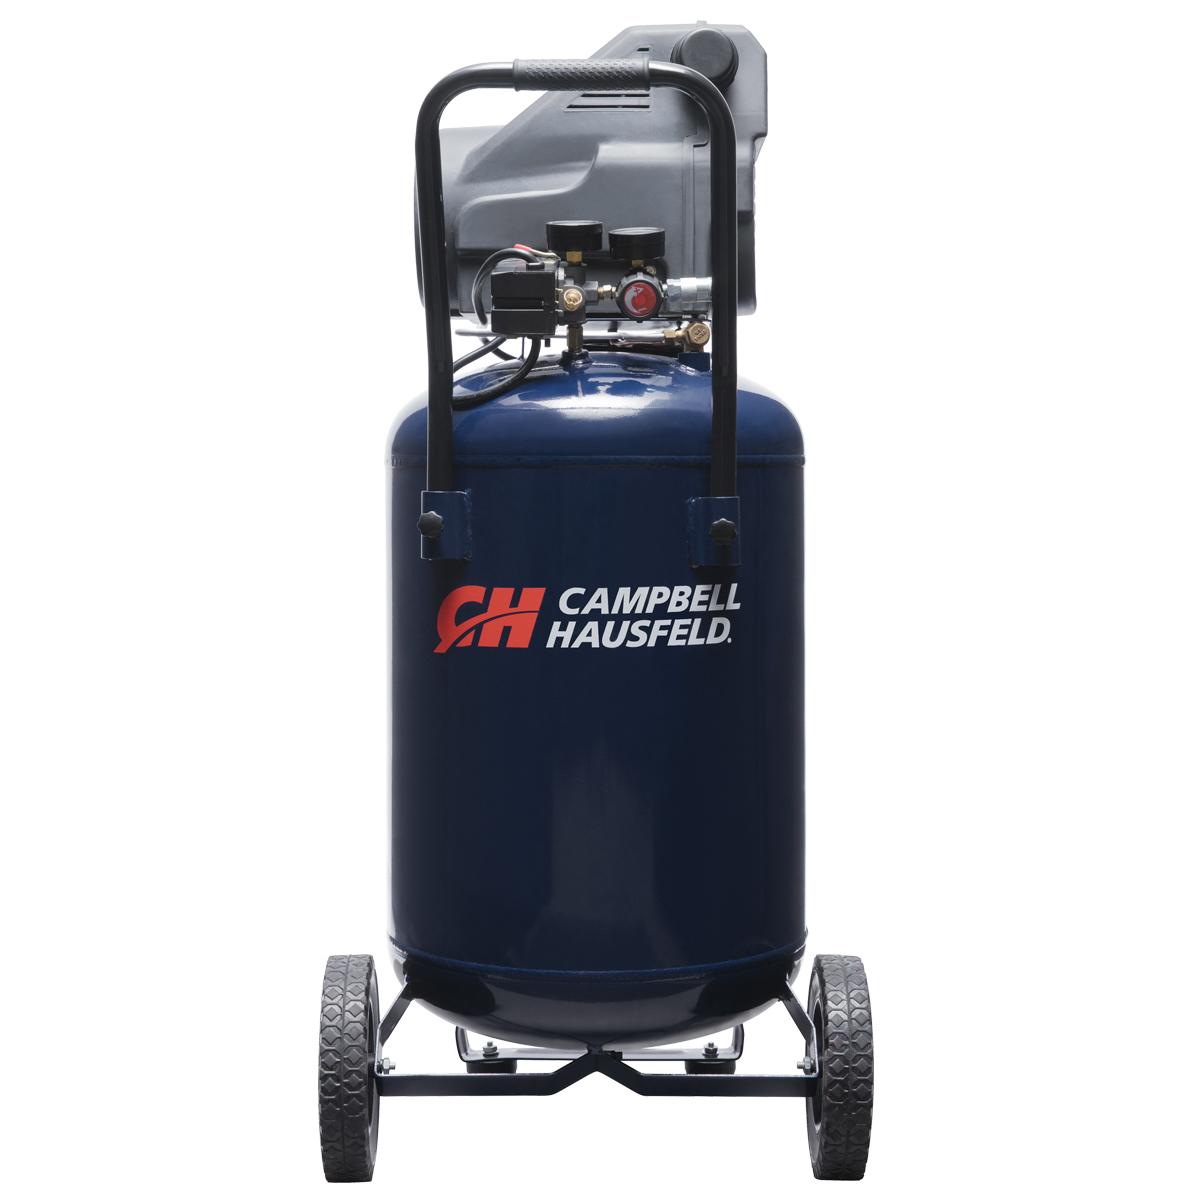 Refrigerator Compressor Wiring Diagram 230v Starting Know About Campbell Hausfeld Air Dayton Hoist